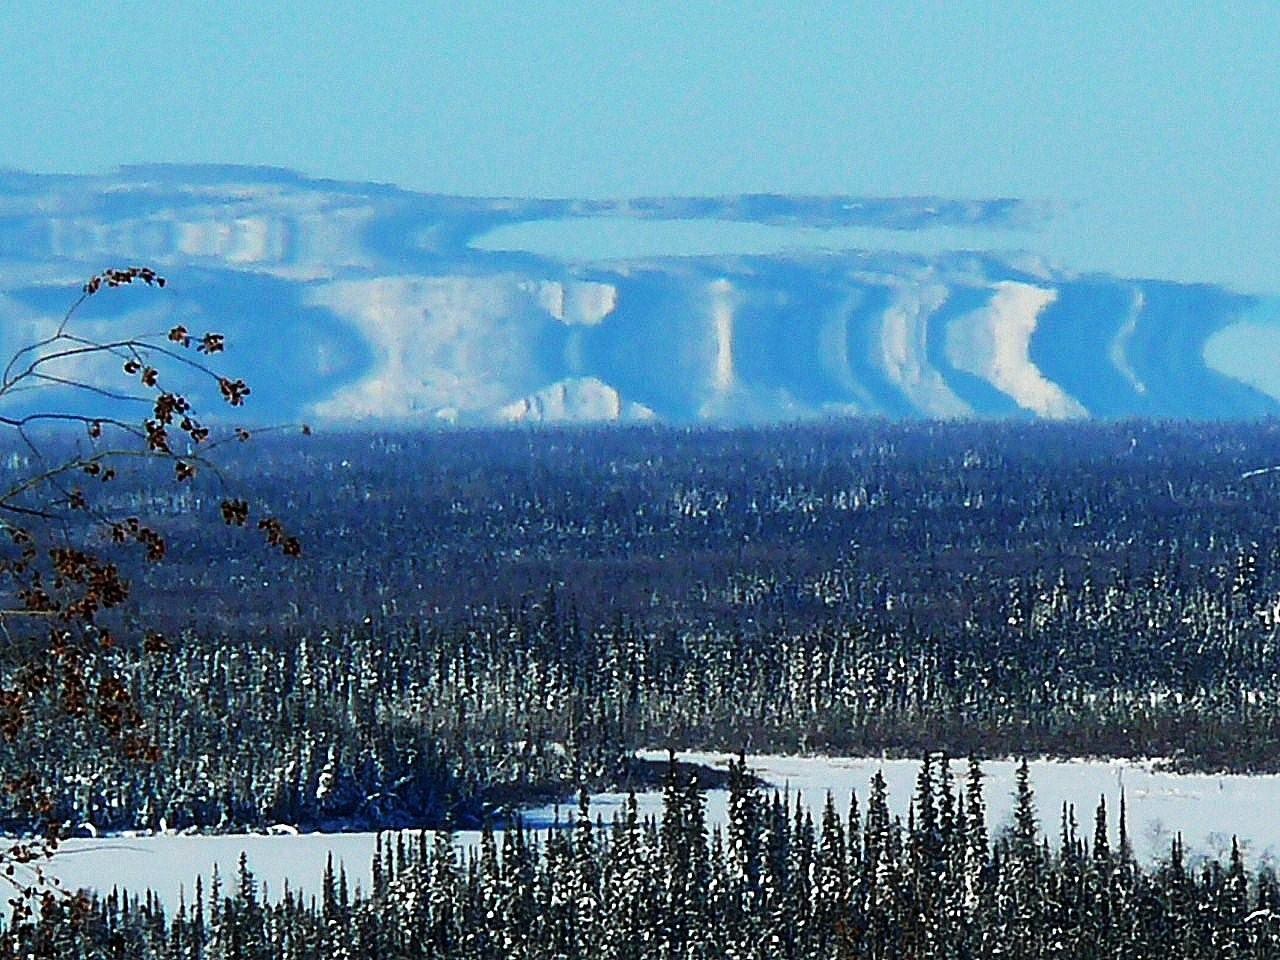 Fata Morgana vista no Alaska, em 20/02/2008. Foto de David Cartier.